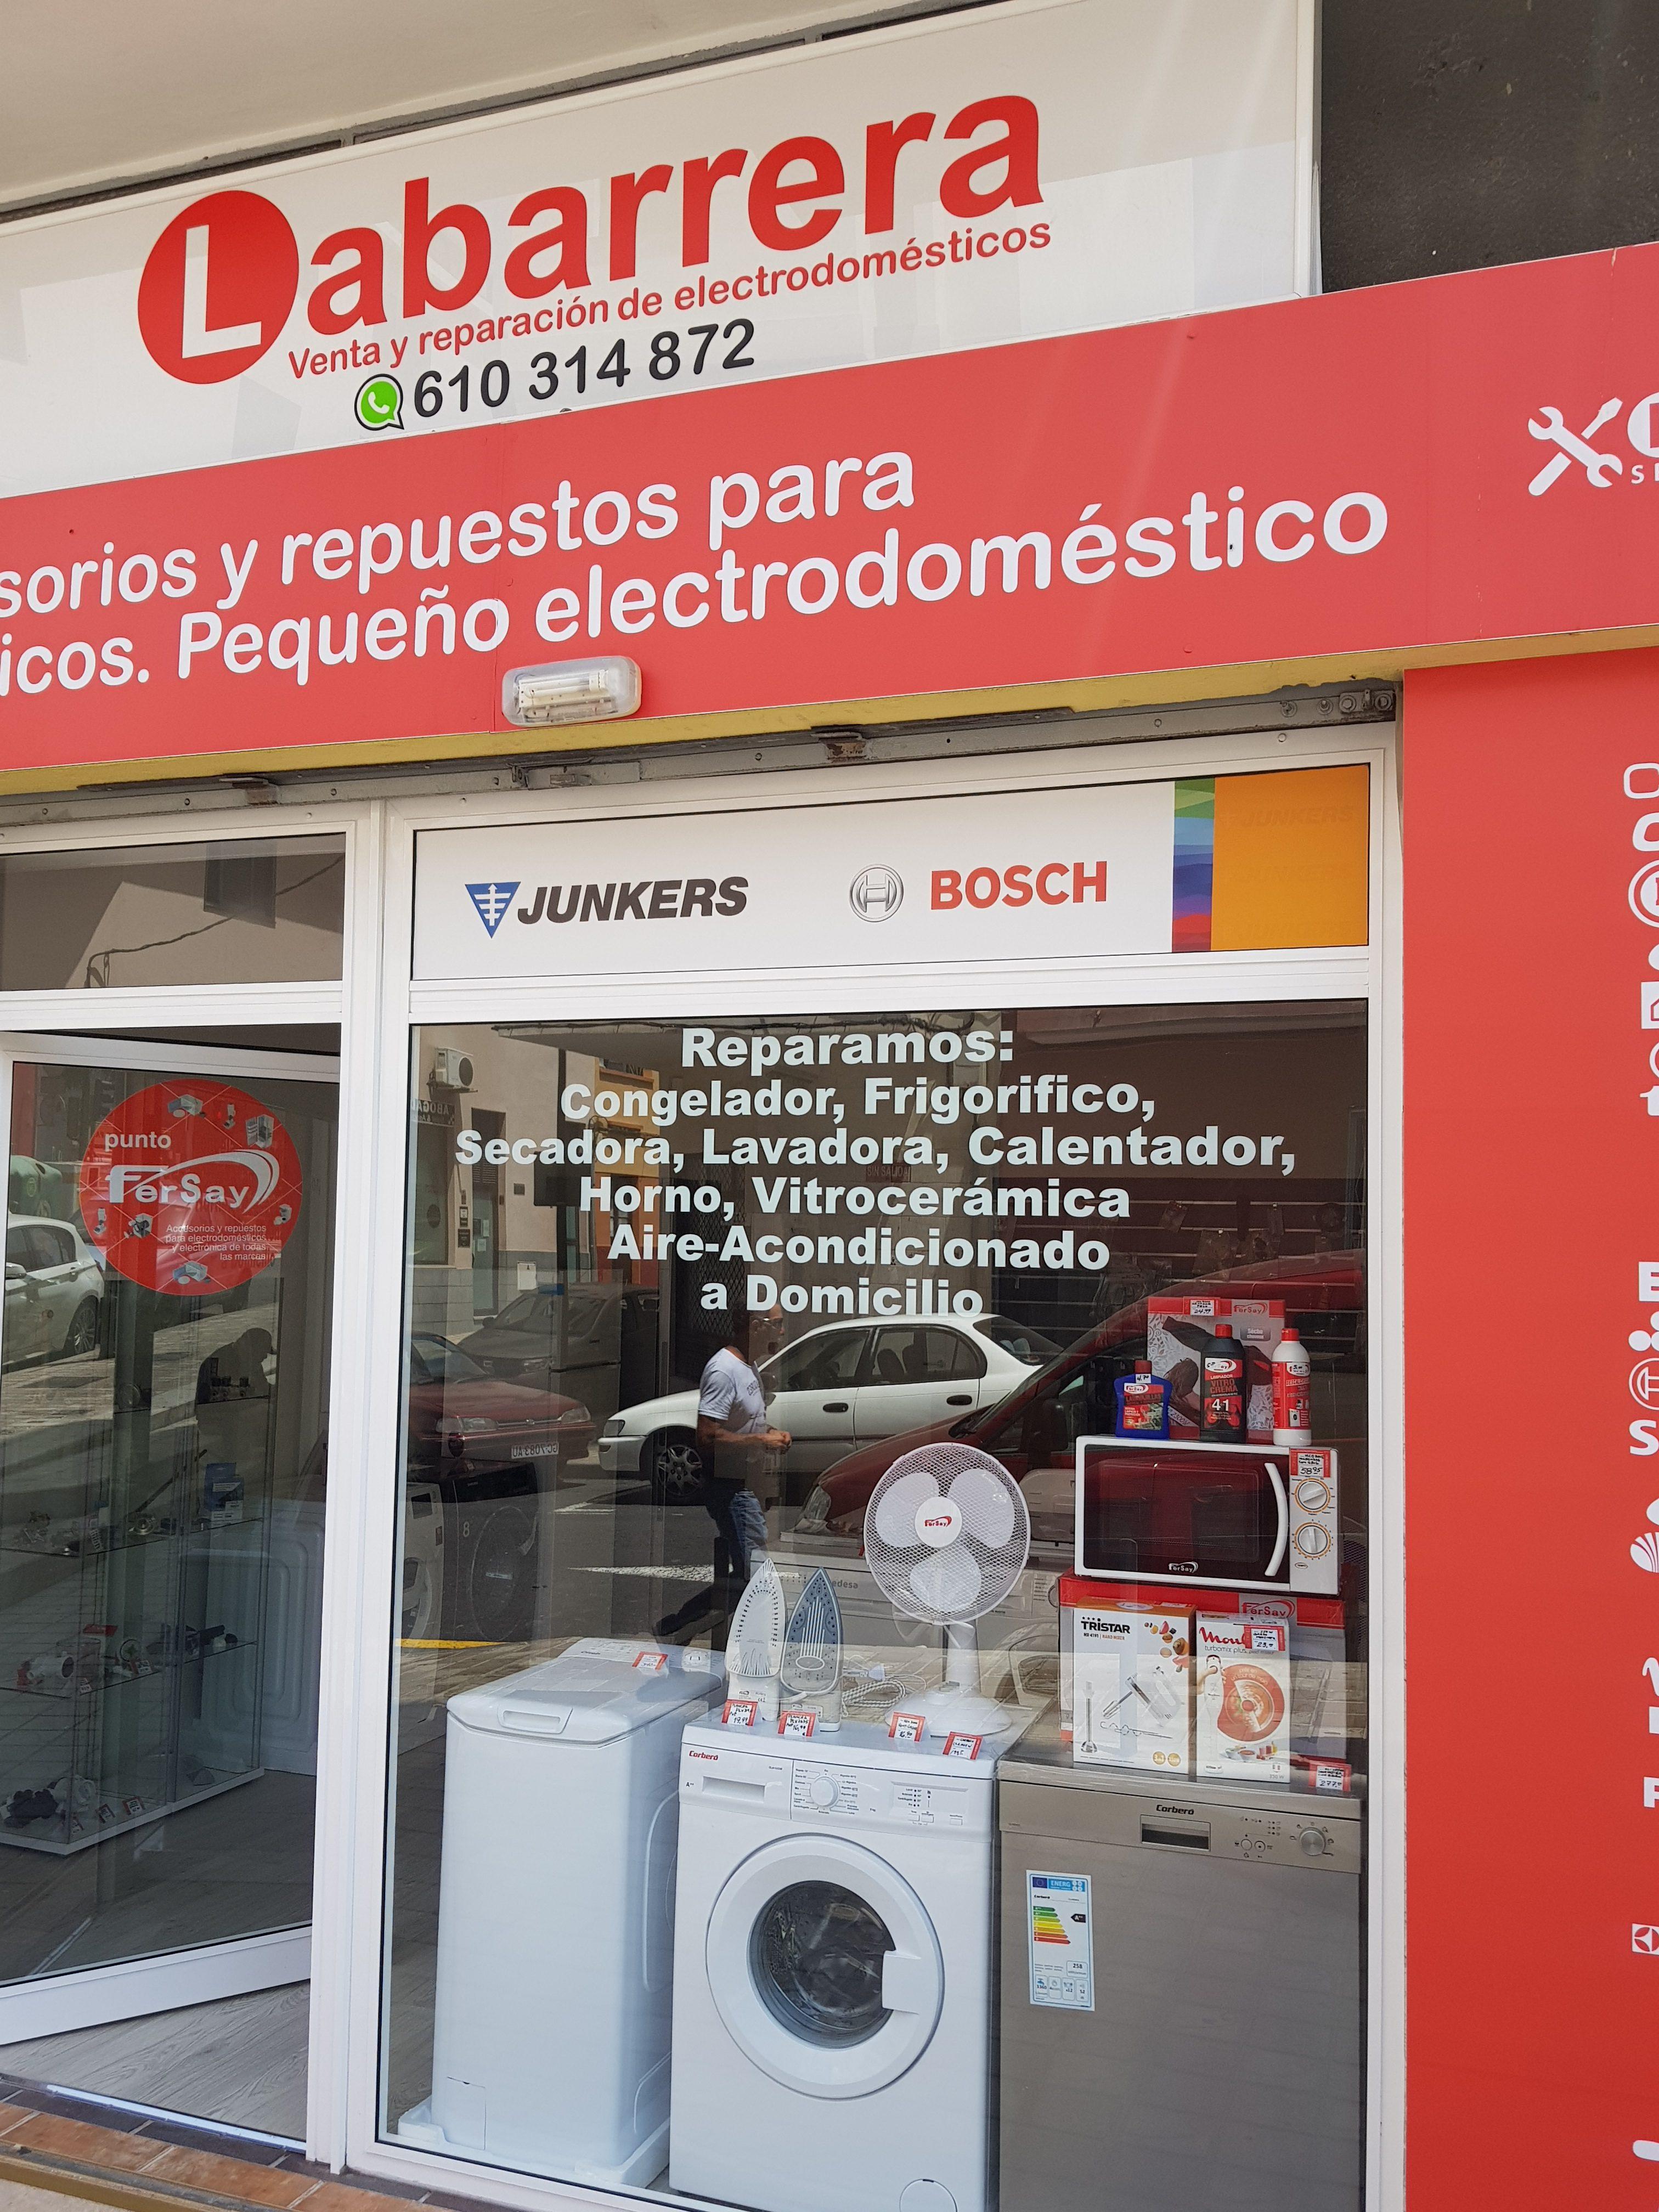 Servicio Técnico Calentadores Tenerife